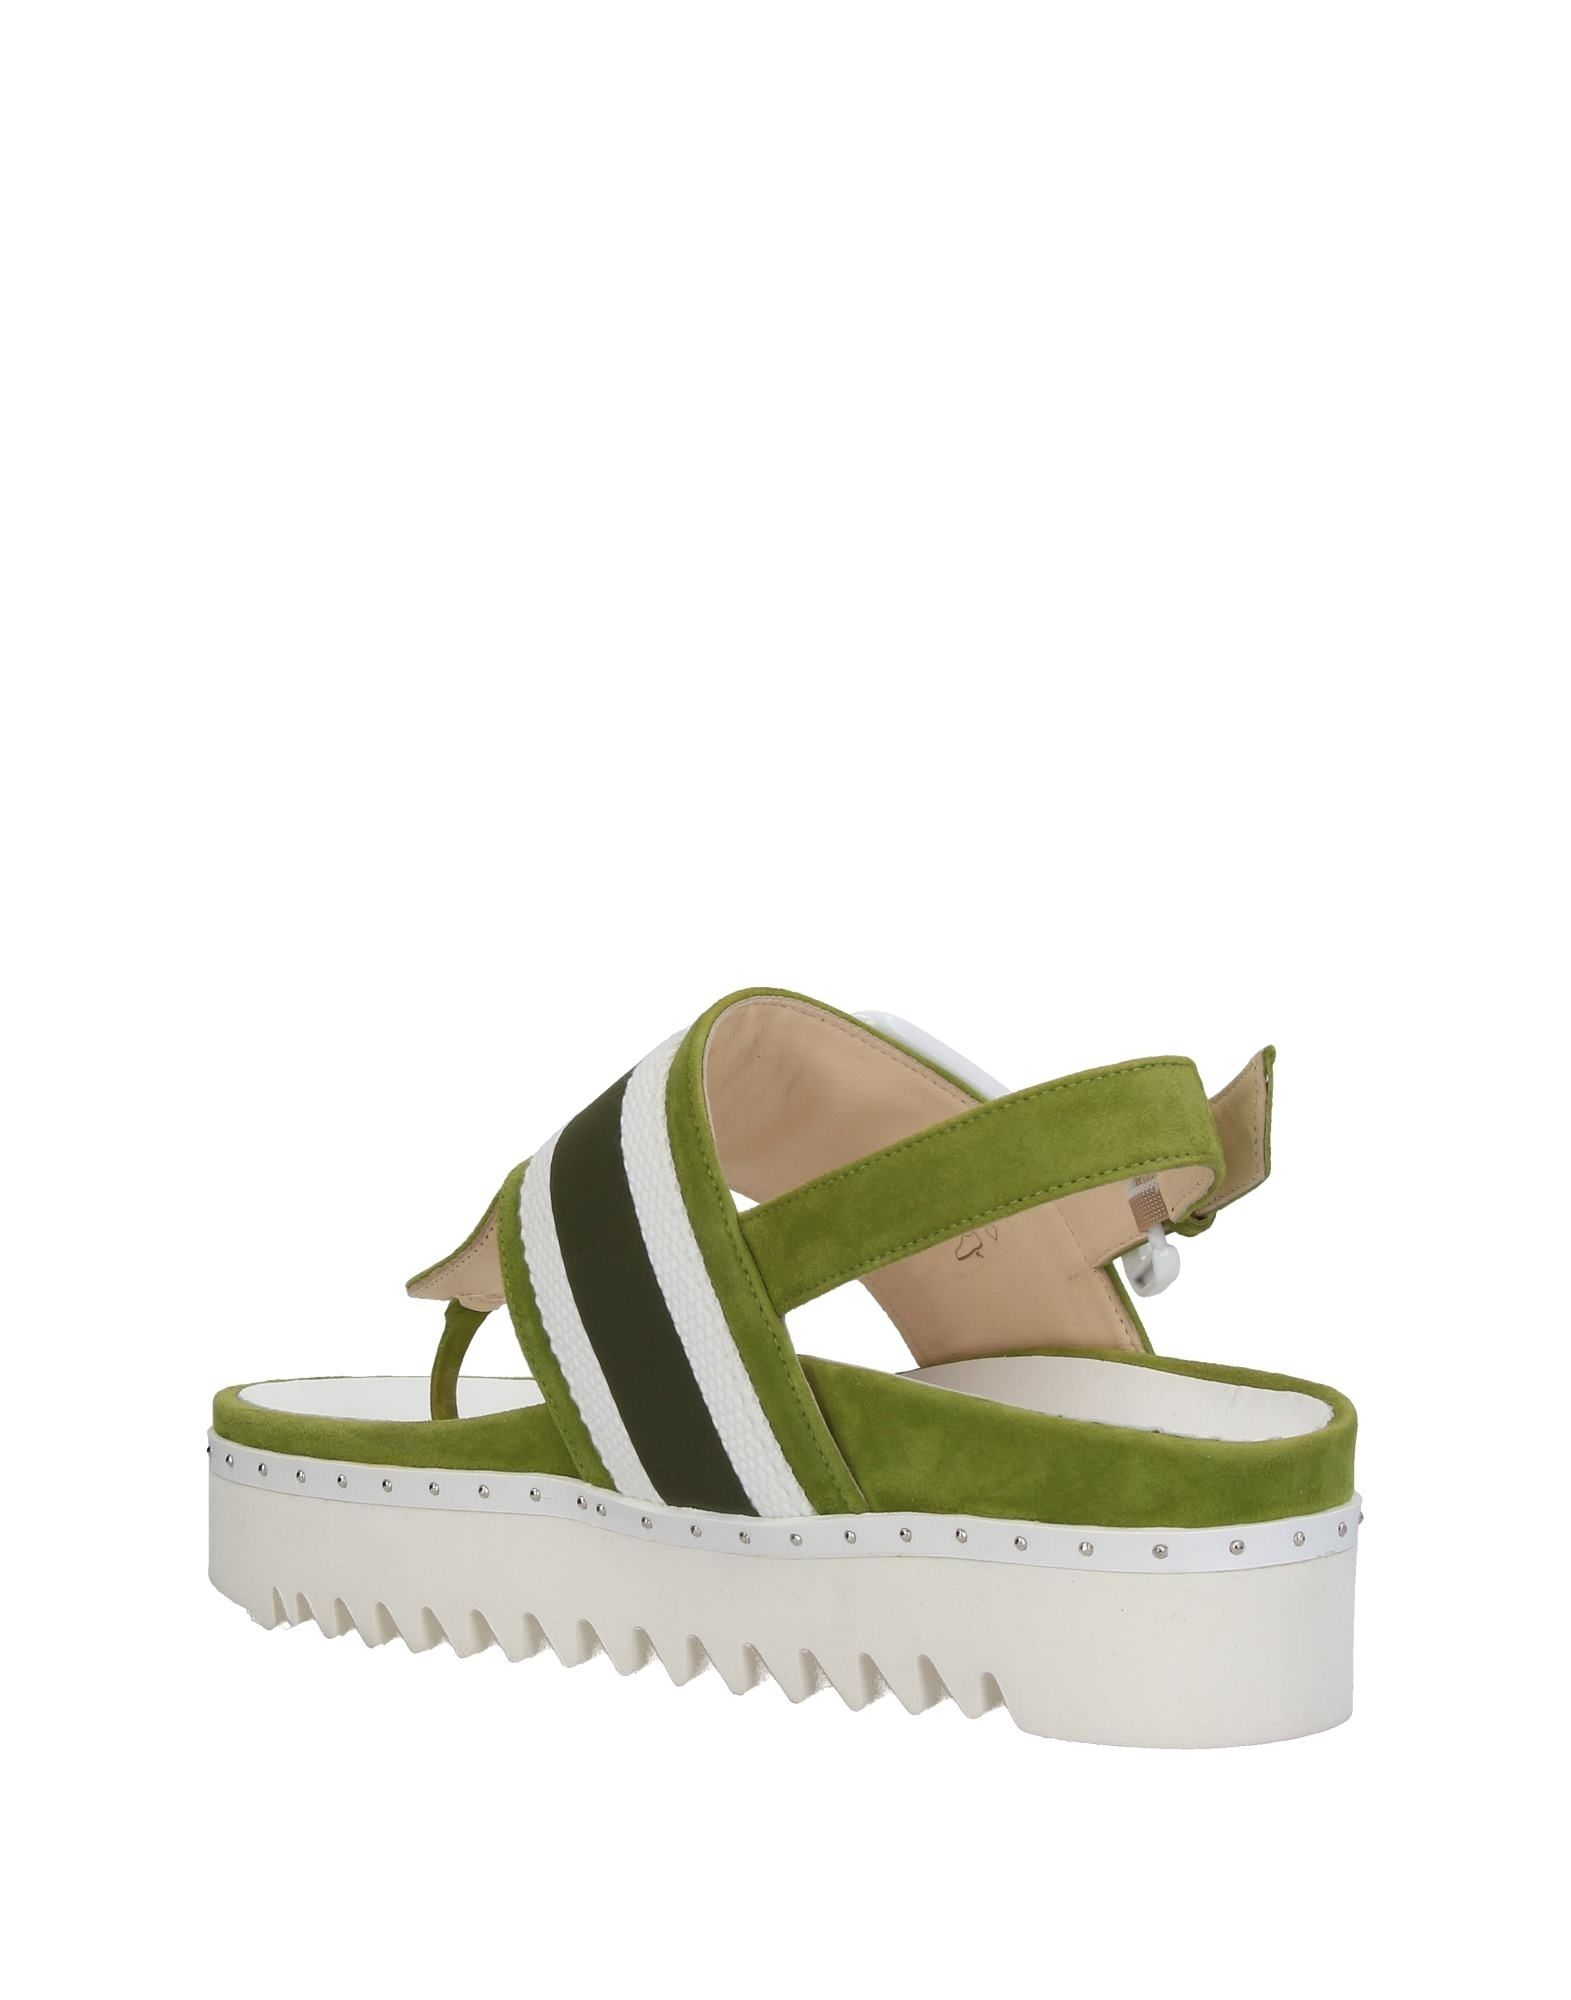 Fabi Dianetten Damen  11415979BP Heiße Schuhe Schuhe Schuhe 85dcd5